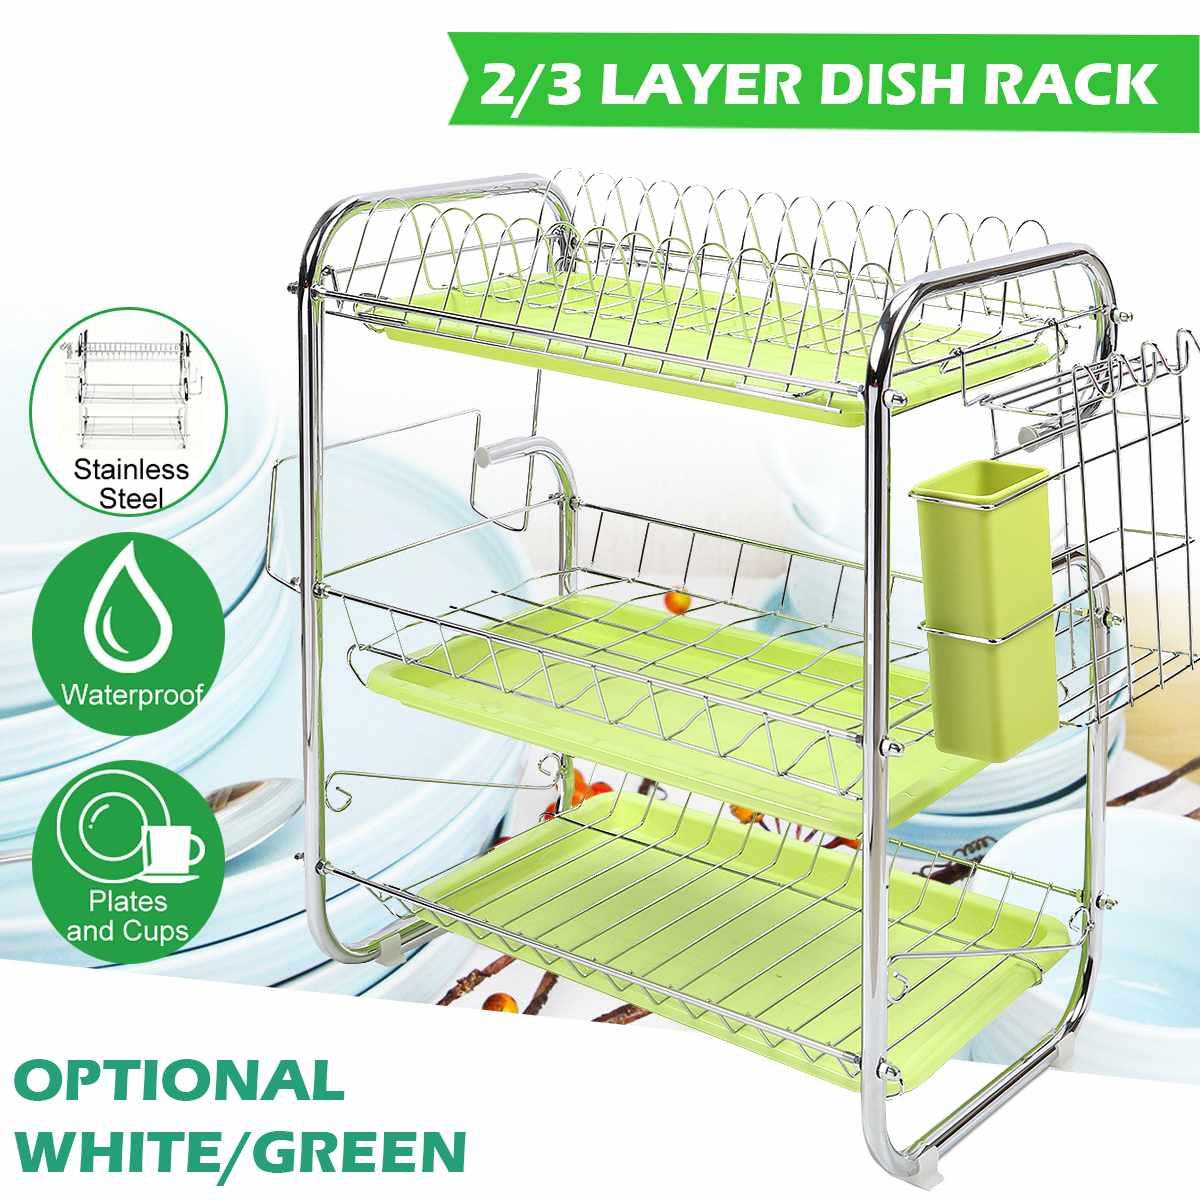 2/3 Layer Dish Drainer Iron Art Kitchen Cutlery Drain Rack Utensils Storage Organizer Rustproof Dishes Plates Organization Shelf